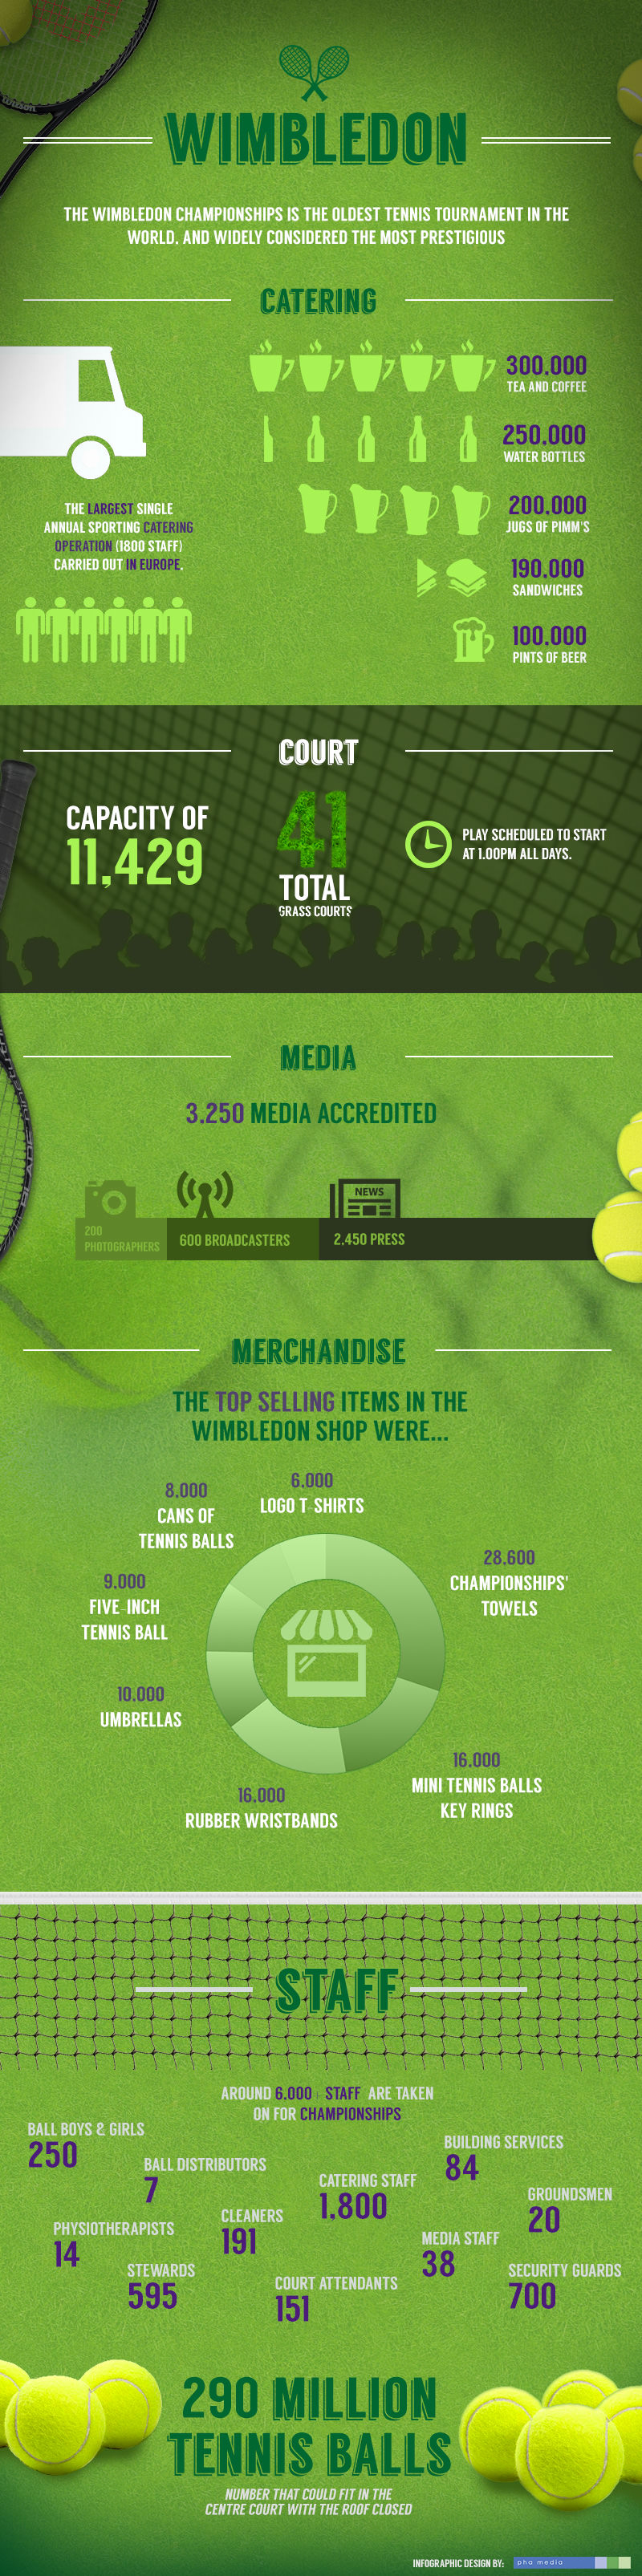 Wimbledon Championships Infographic